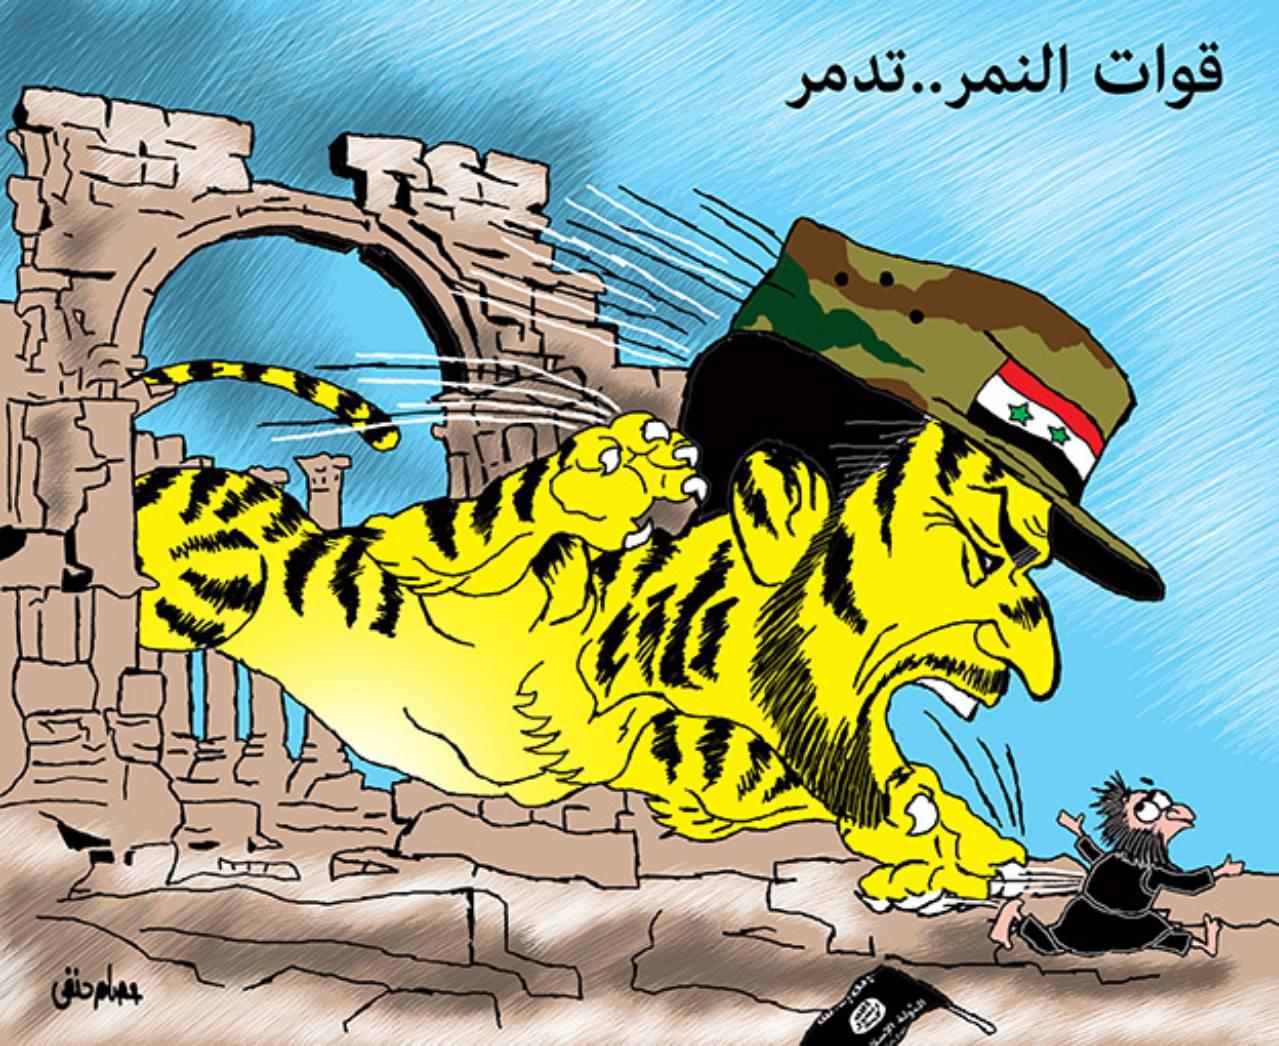 caricature-issamhanafy-syria-nemer